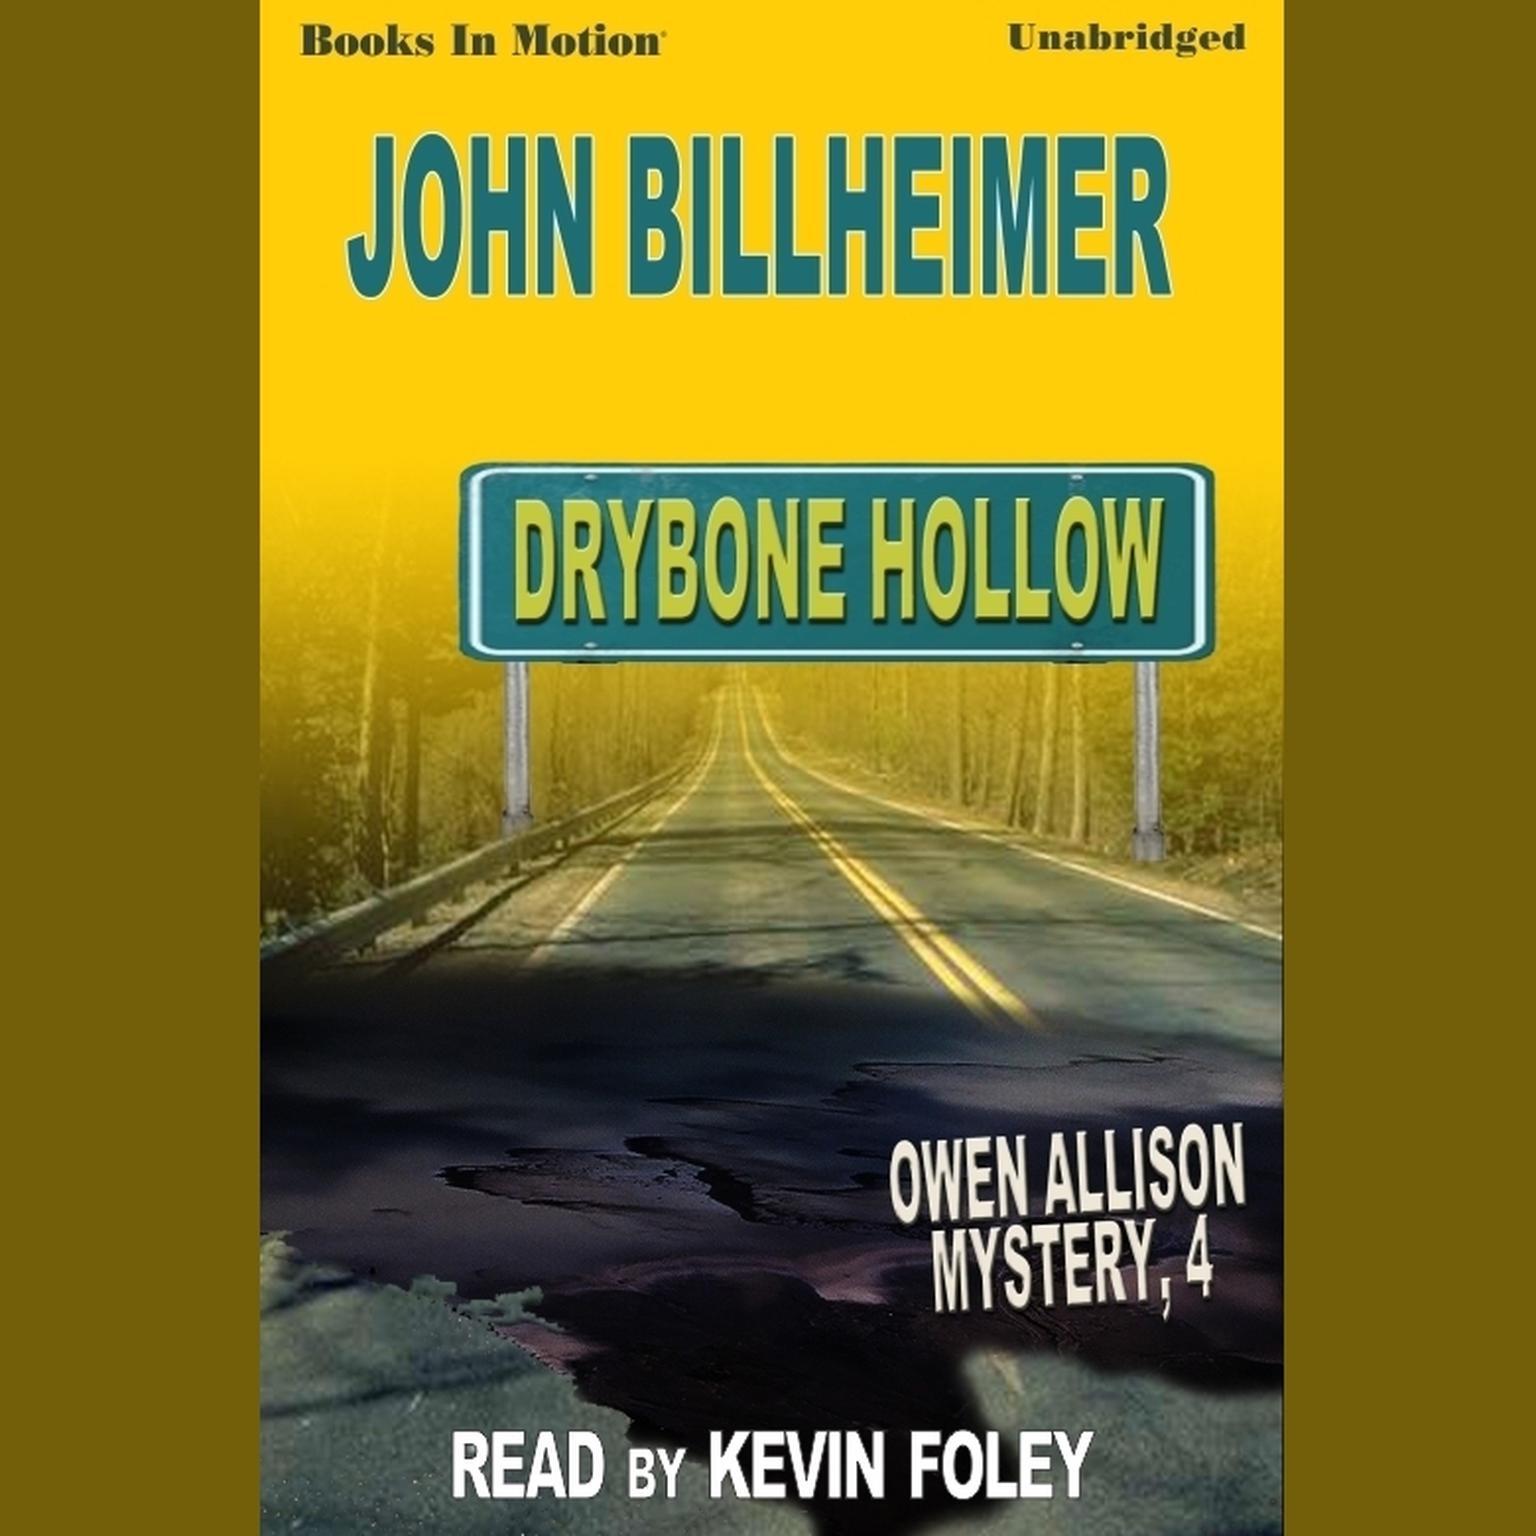 Drybone Hollow Audiobook, by John Billheimer